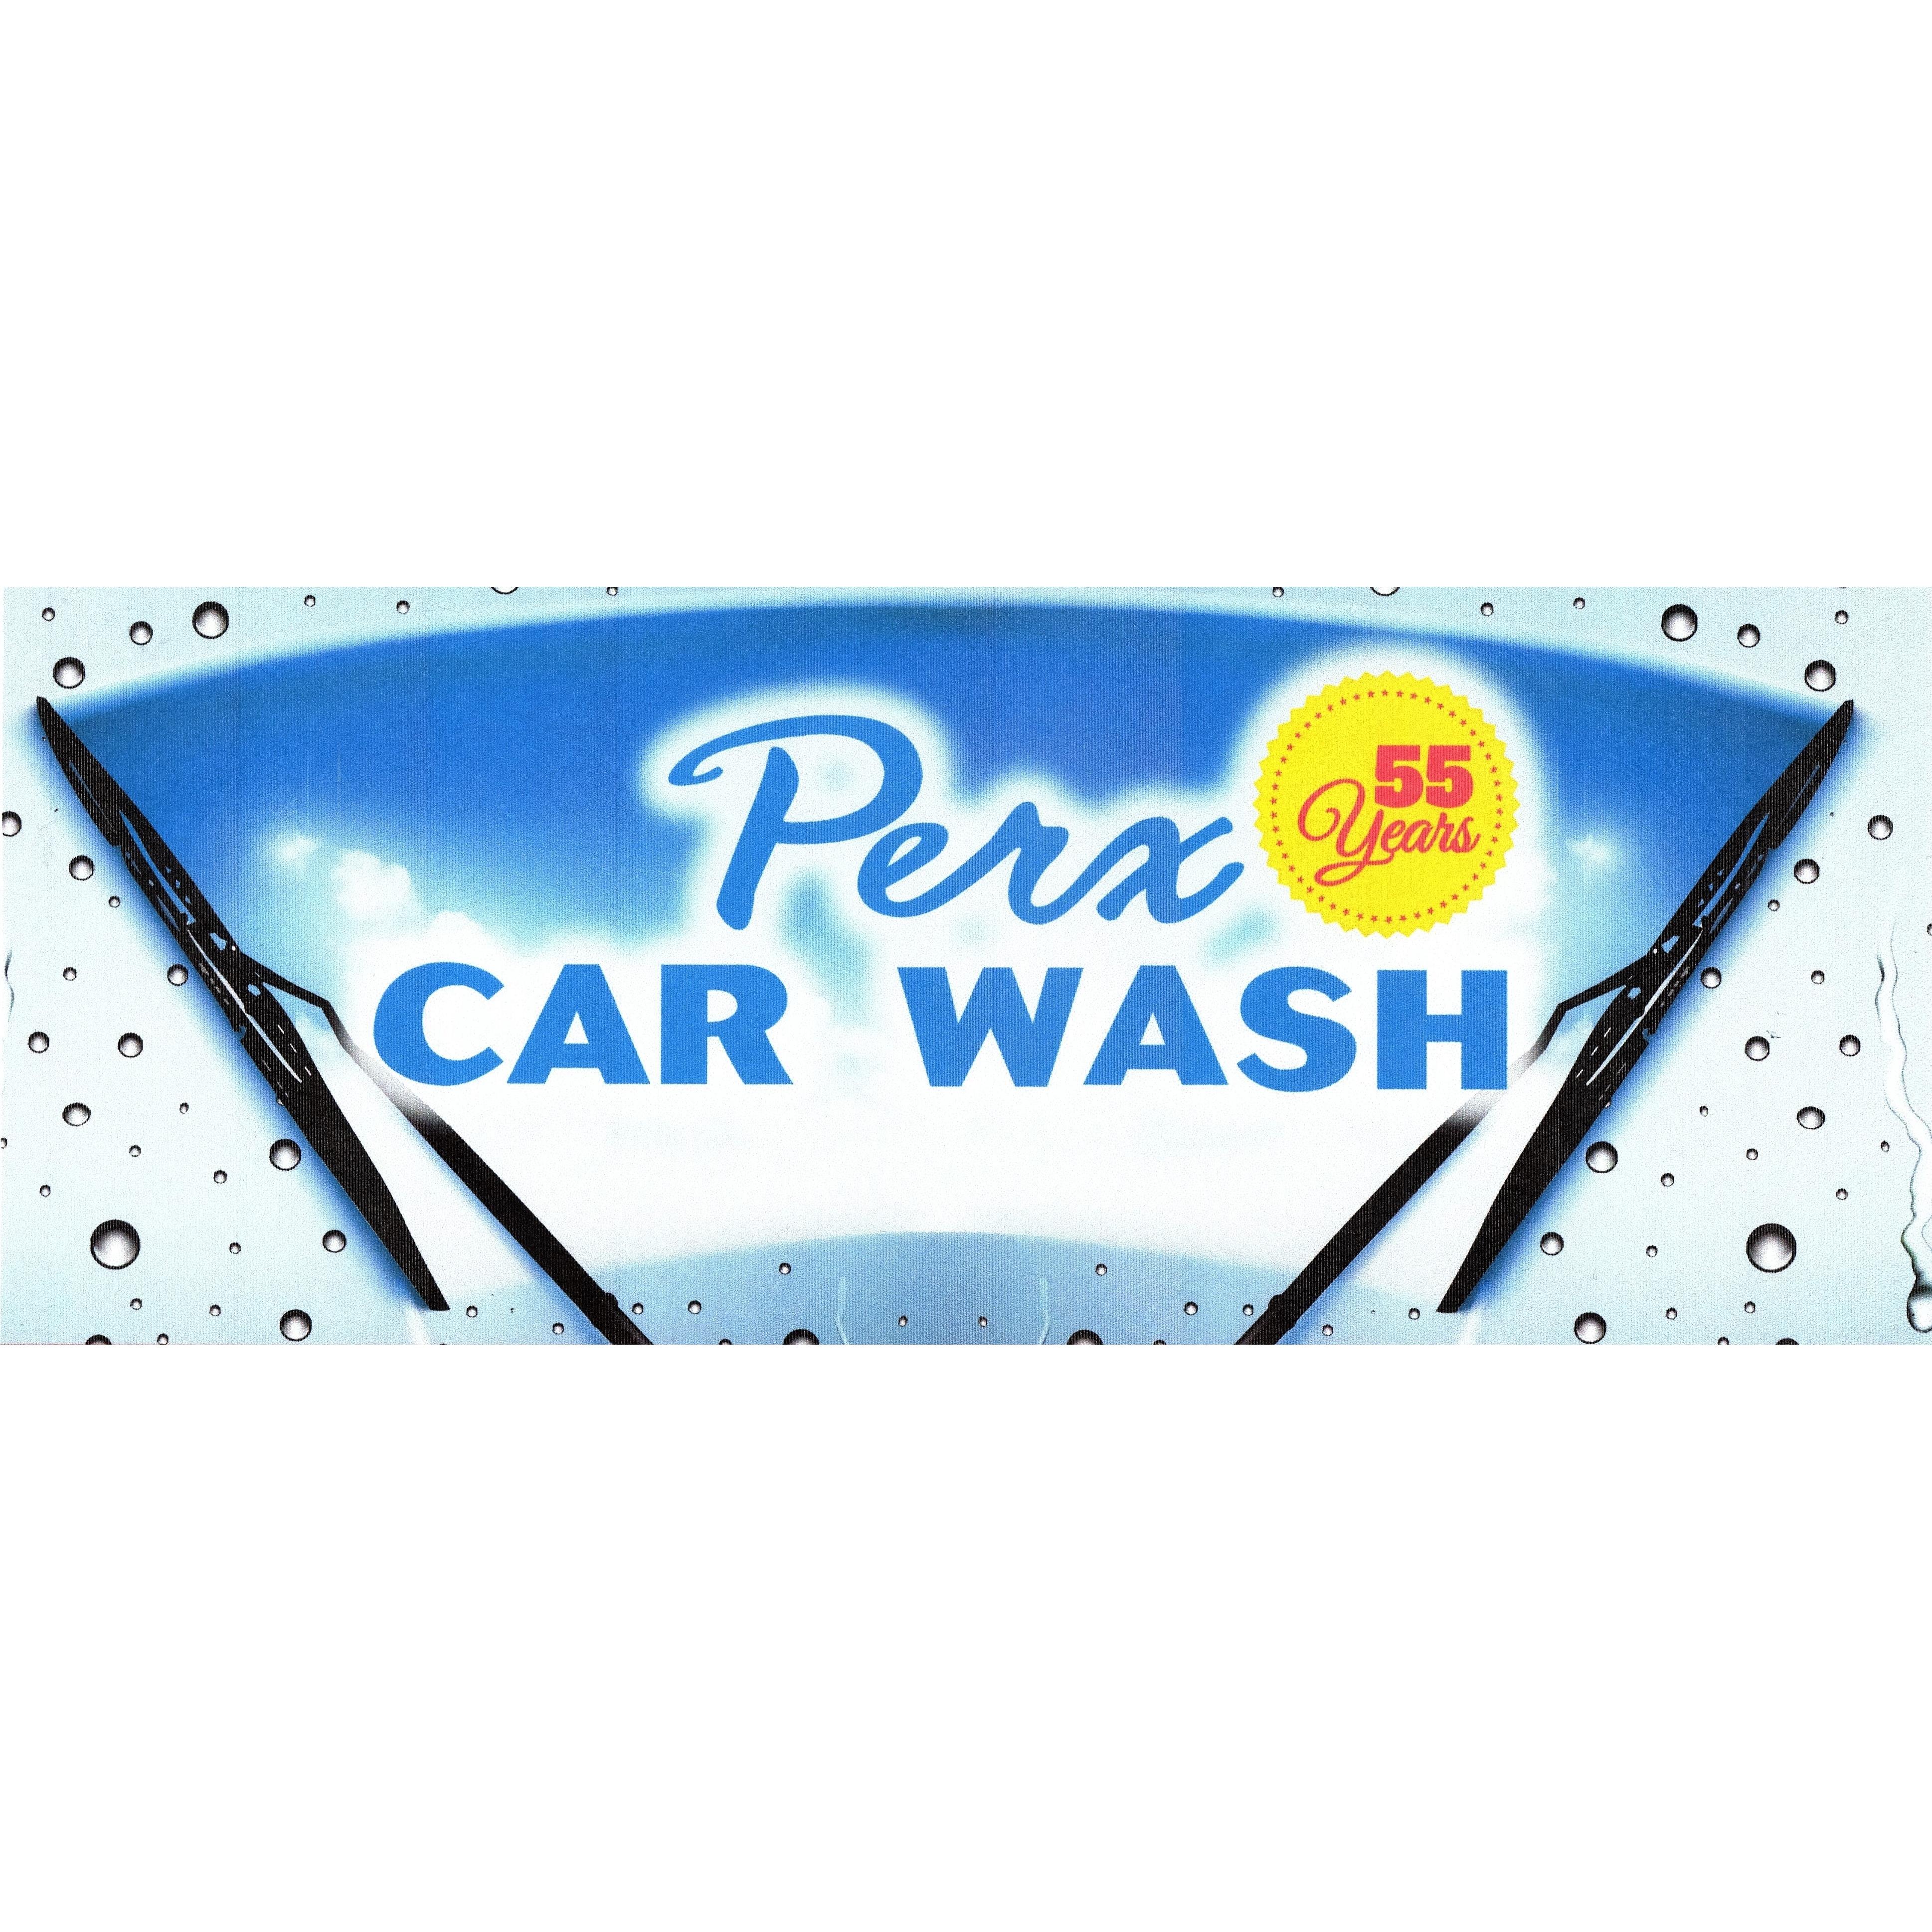 Car Wash Coupons Near Me